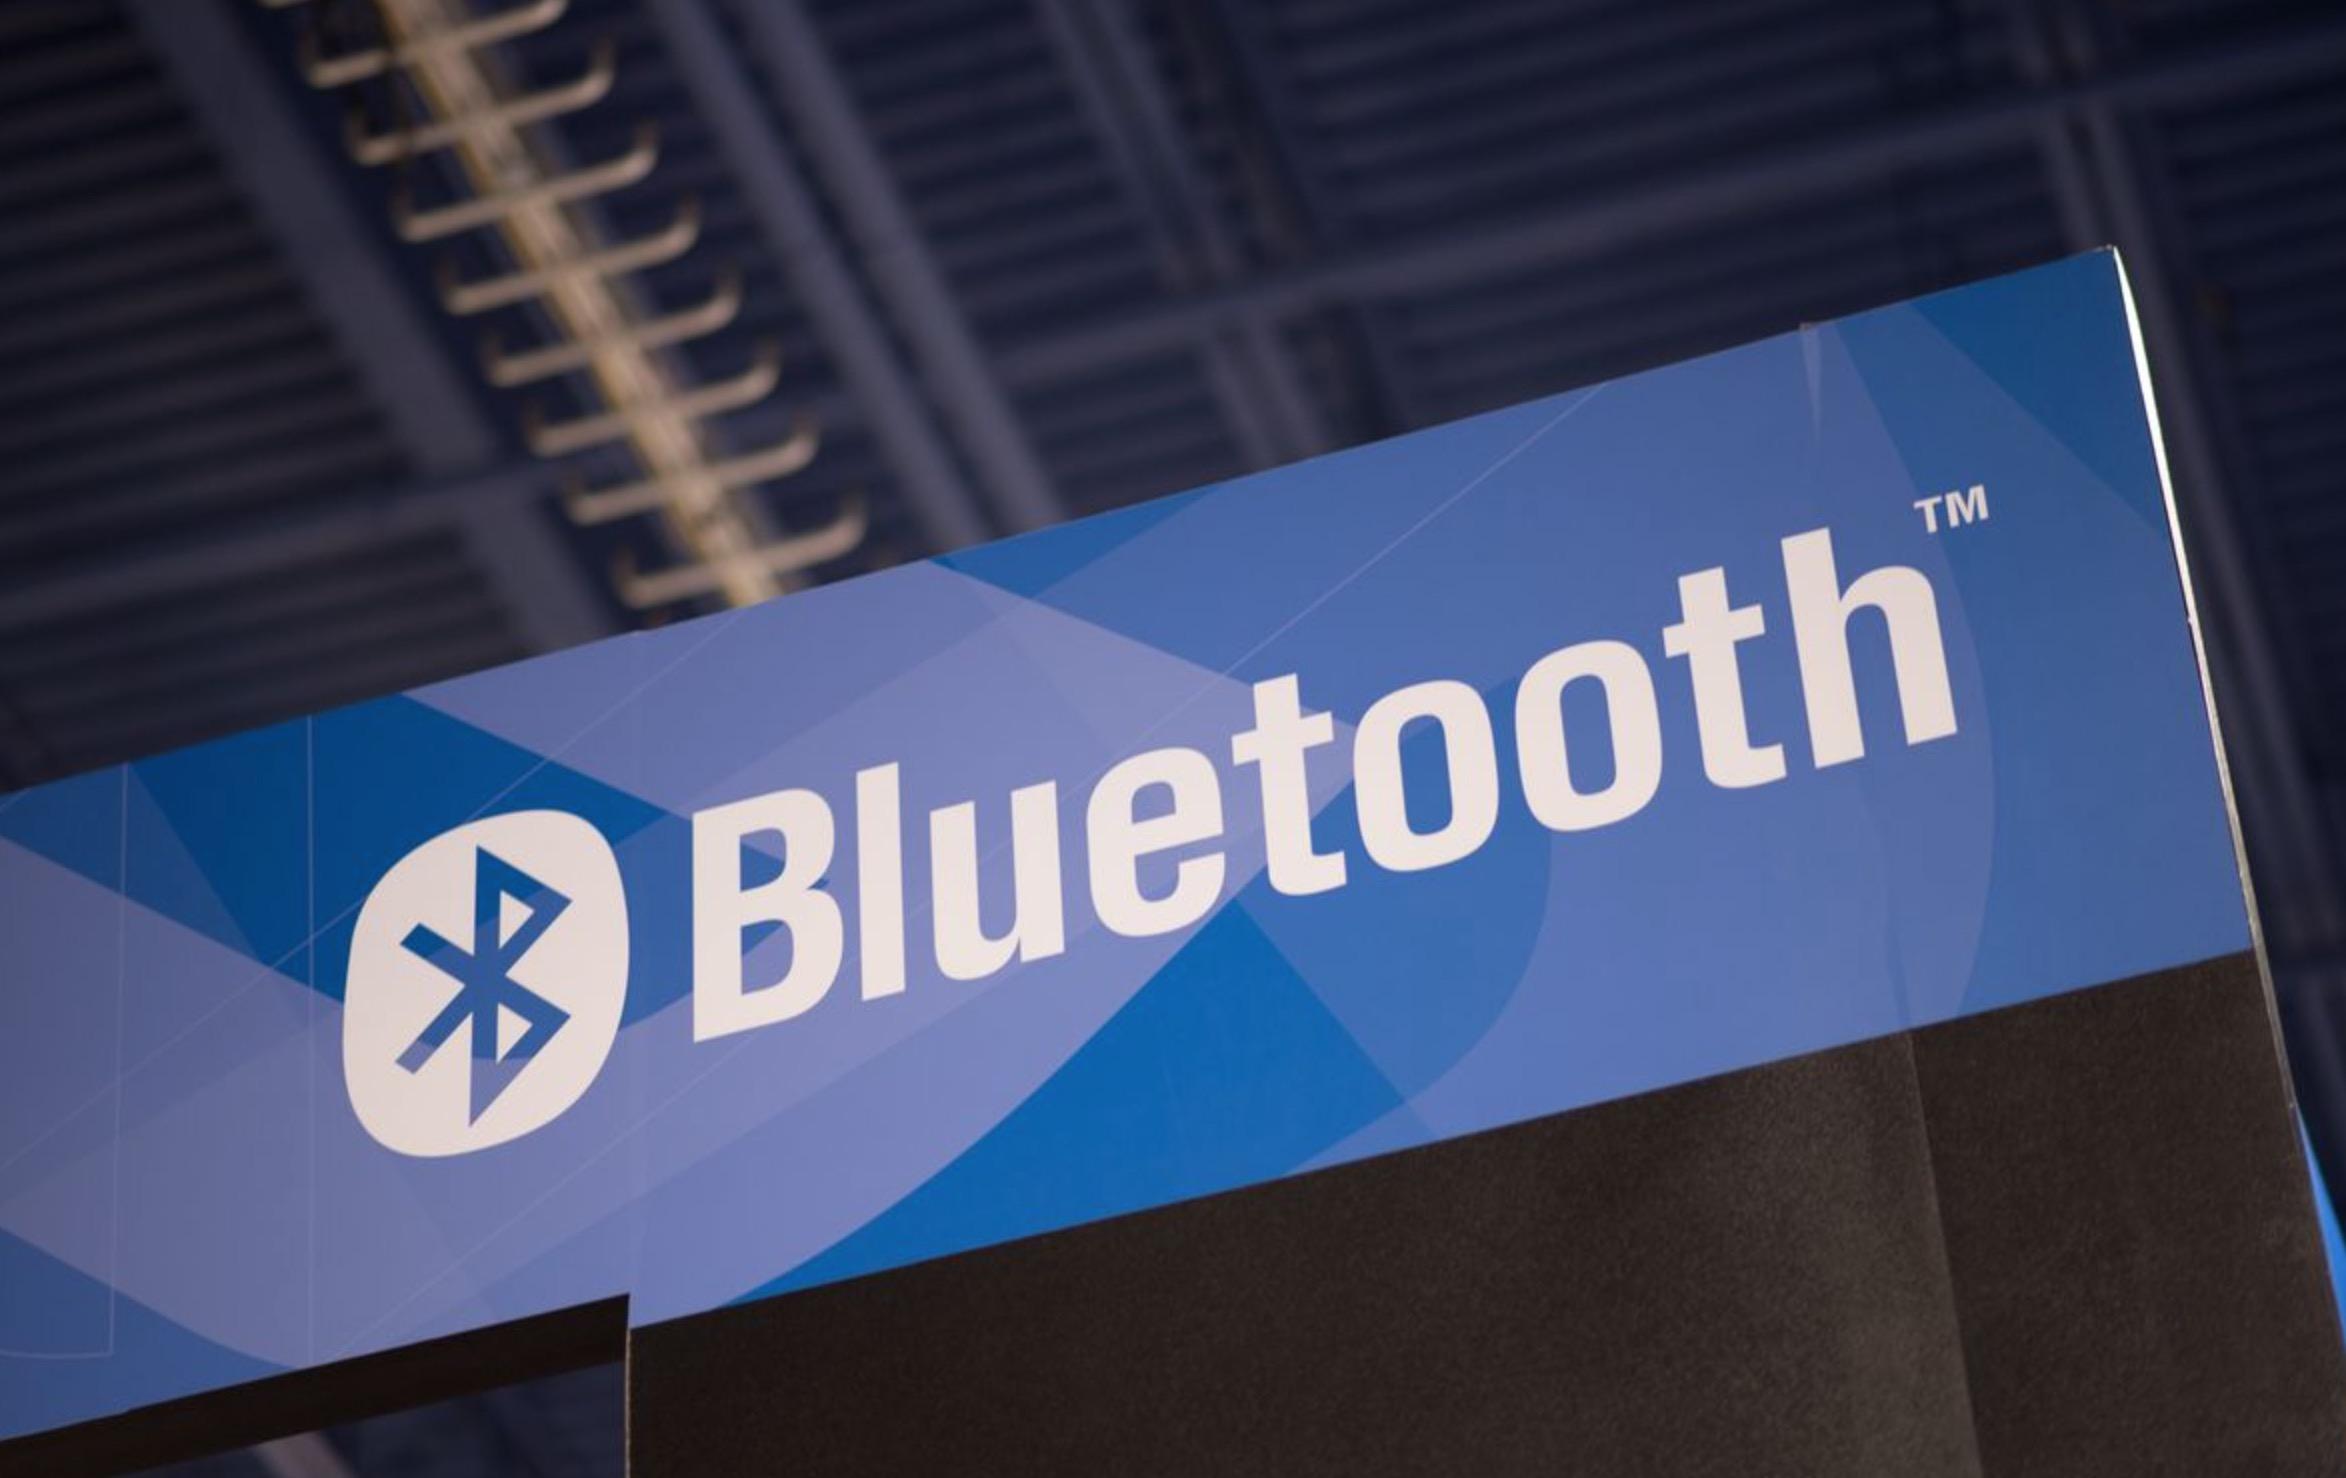 Bluetooth 5: velocità quadruplicata e portata raddoppiata